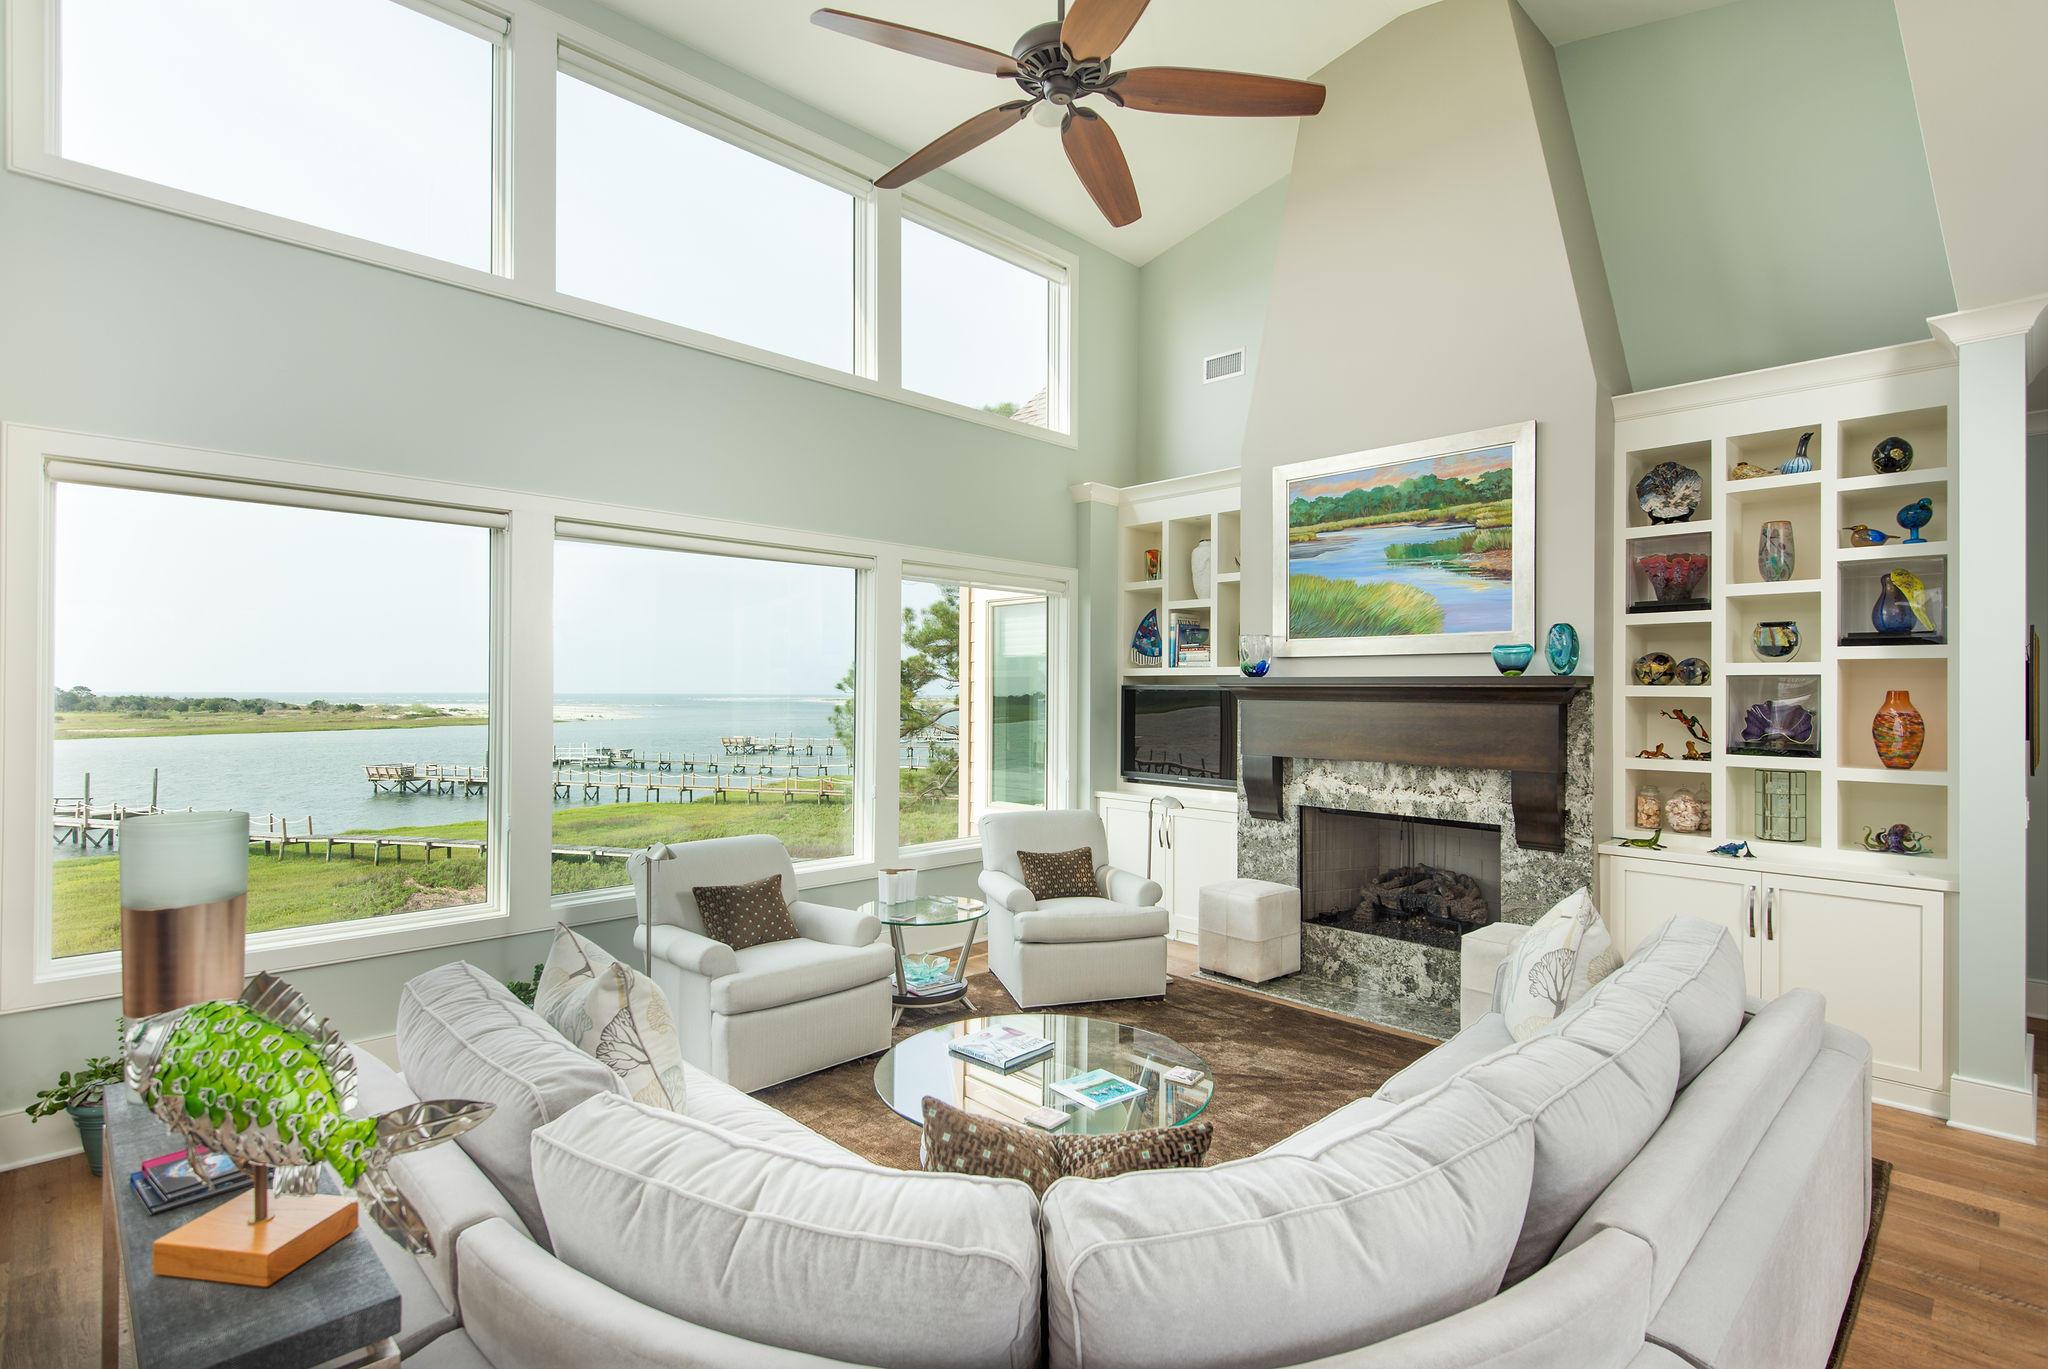 Seabrook Island Homes For Sale - 3135 Marshgate, Seabrook Island, SC - 57